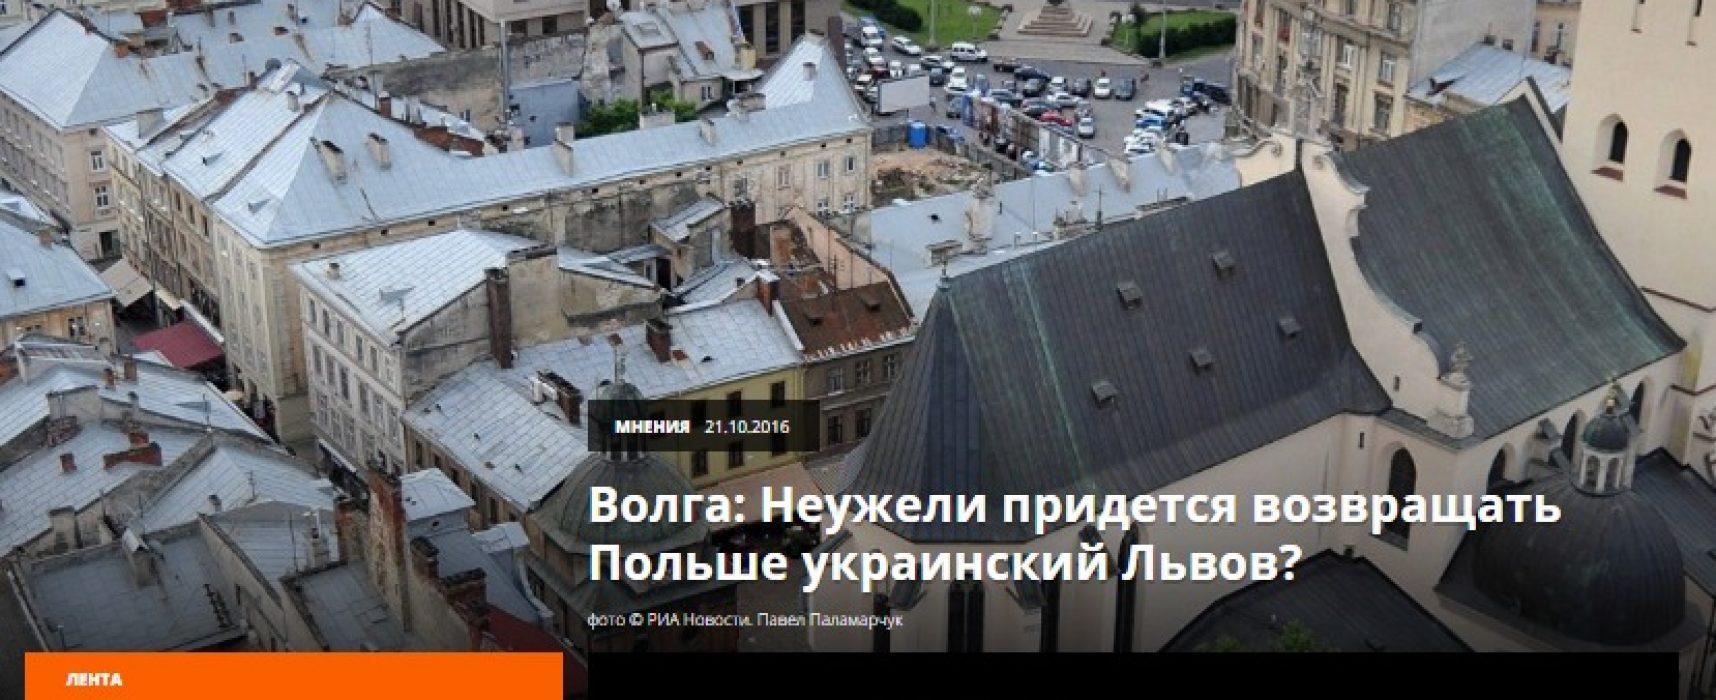 Fake: Ukrajina bude muset vrátit Lviv Polsku